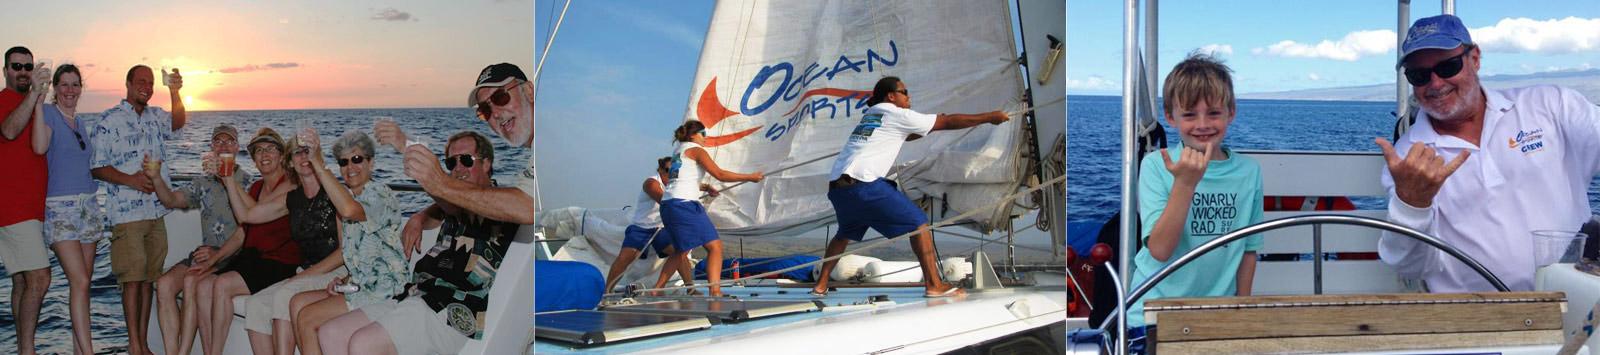 Private Charters - Custom Cruises - Hawaii Ocean Sports